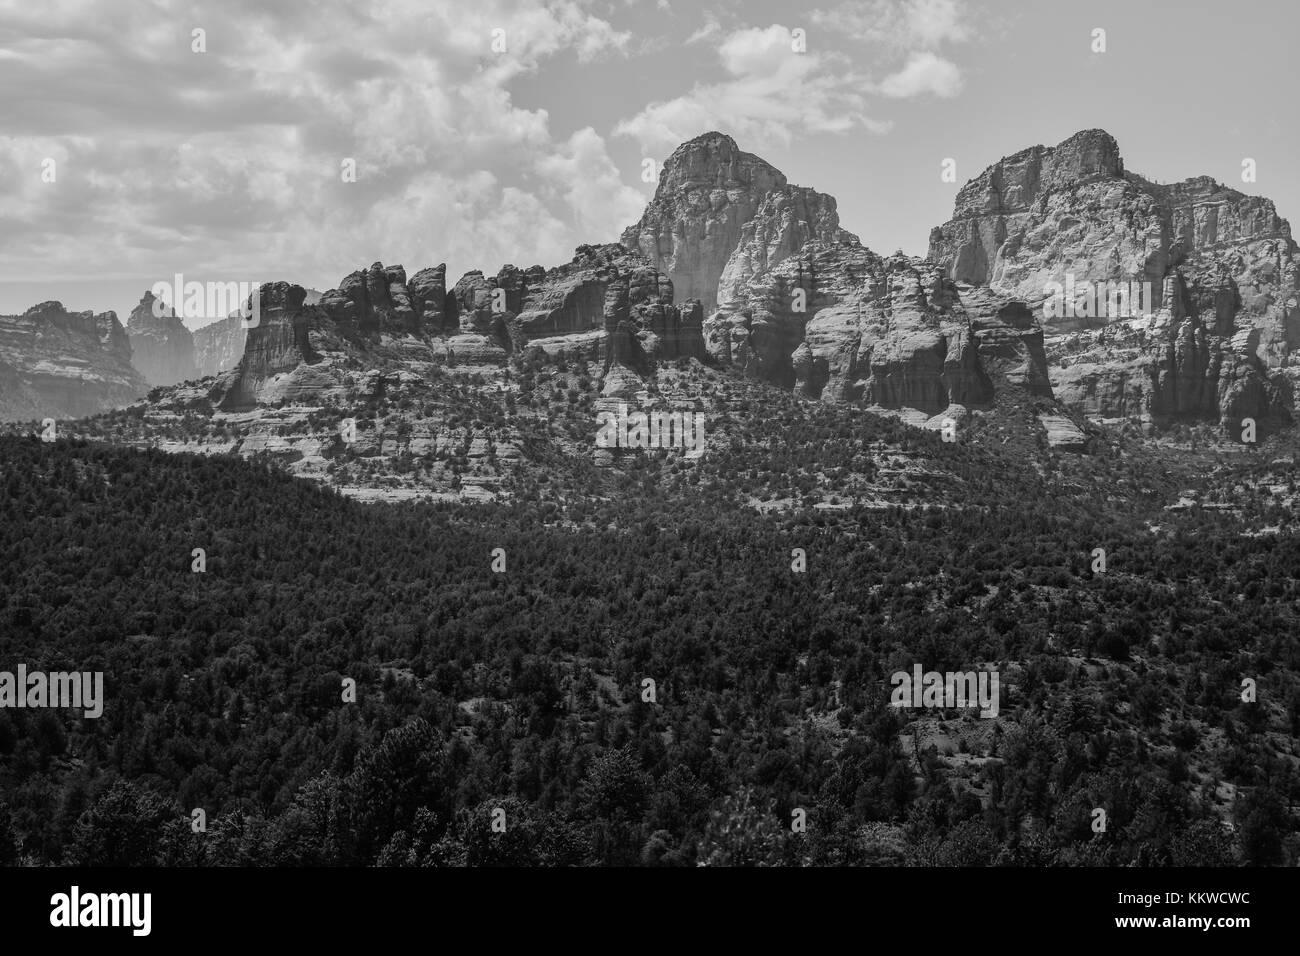 Sedona Arizona Red Rocks Landscape View Black and White - Stock Image